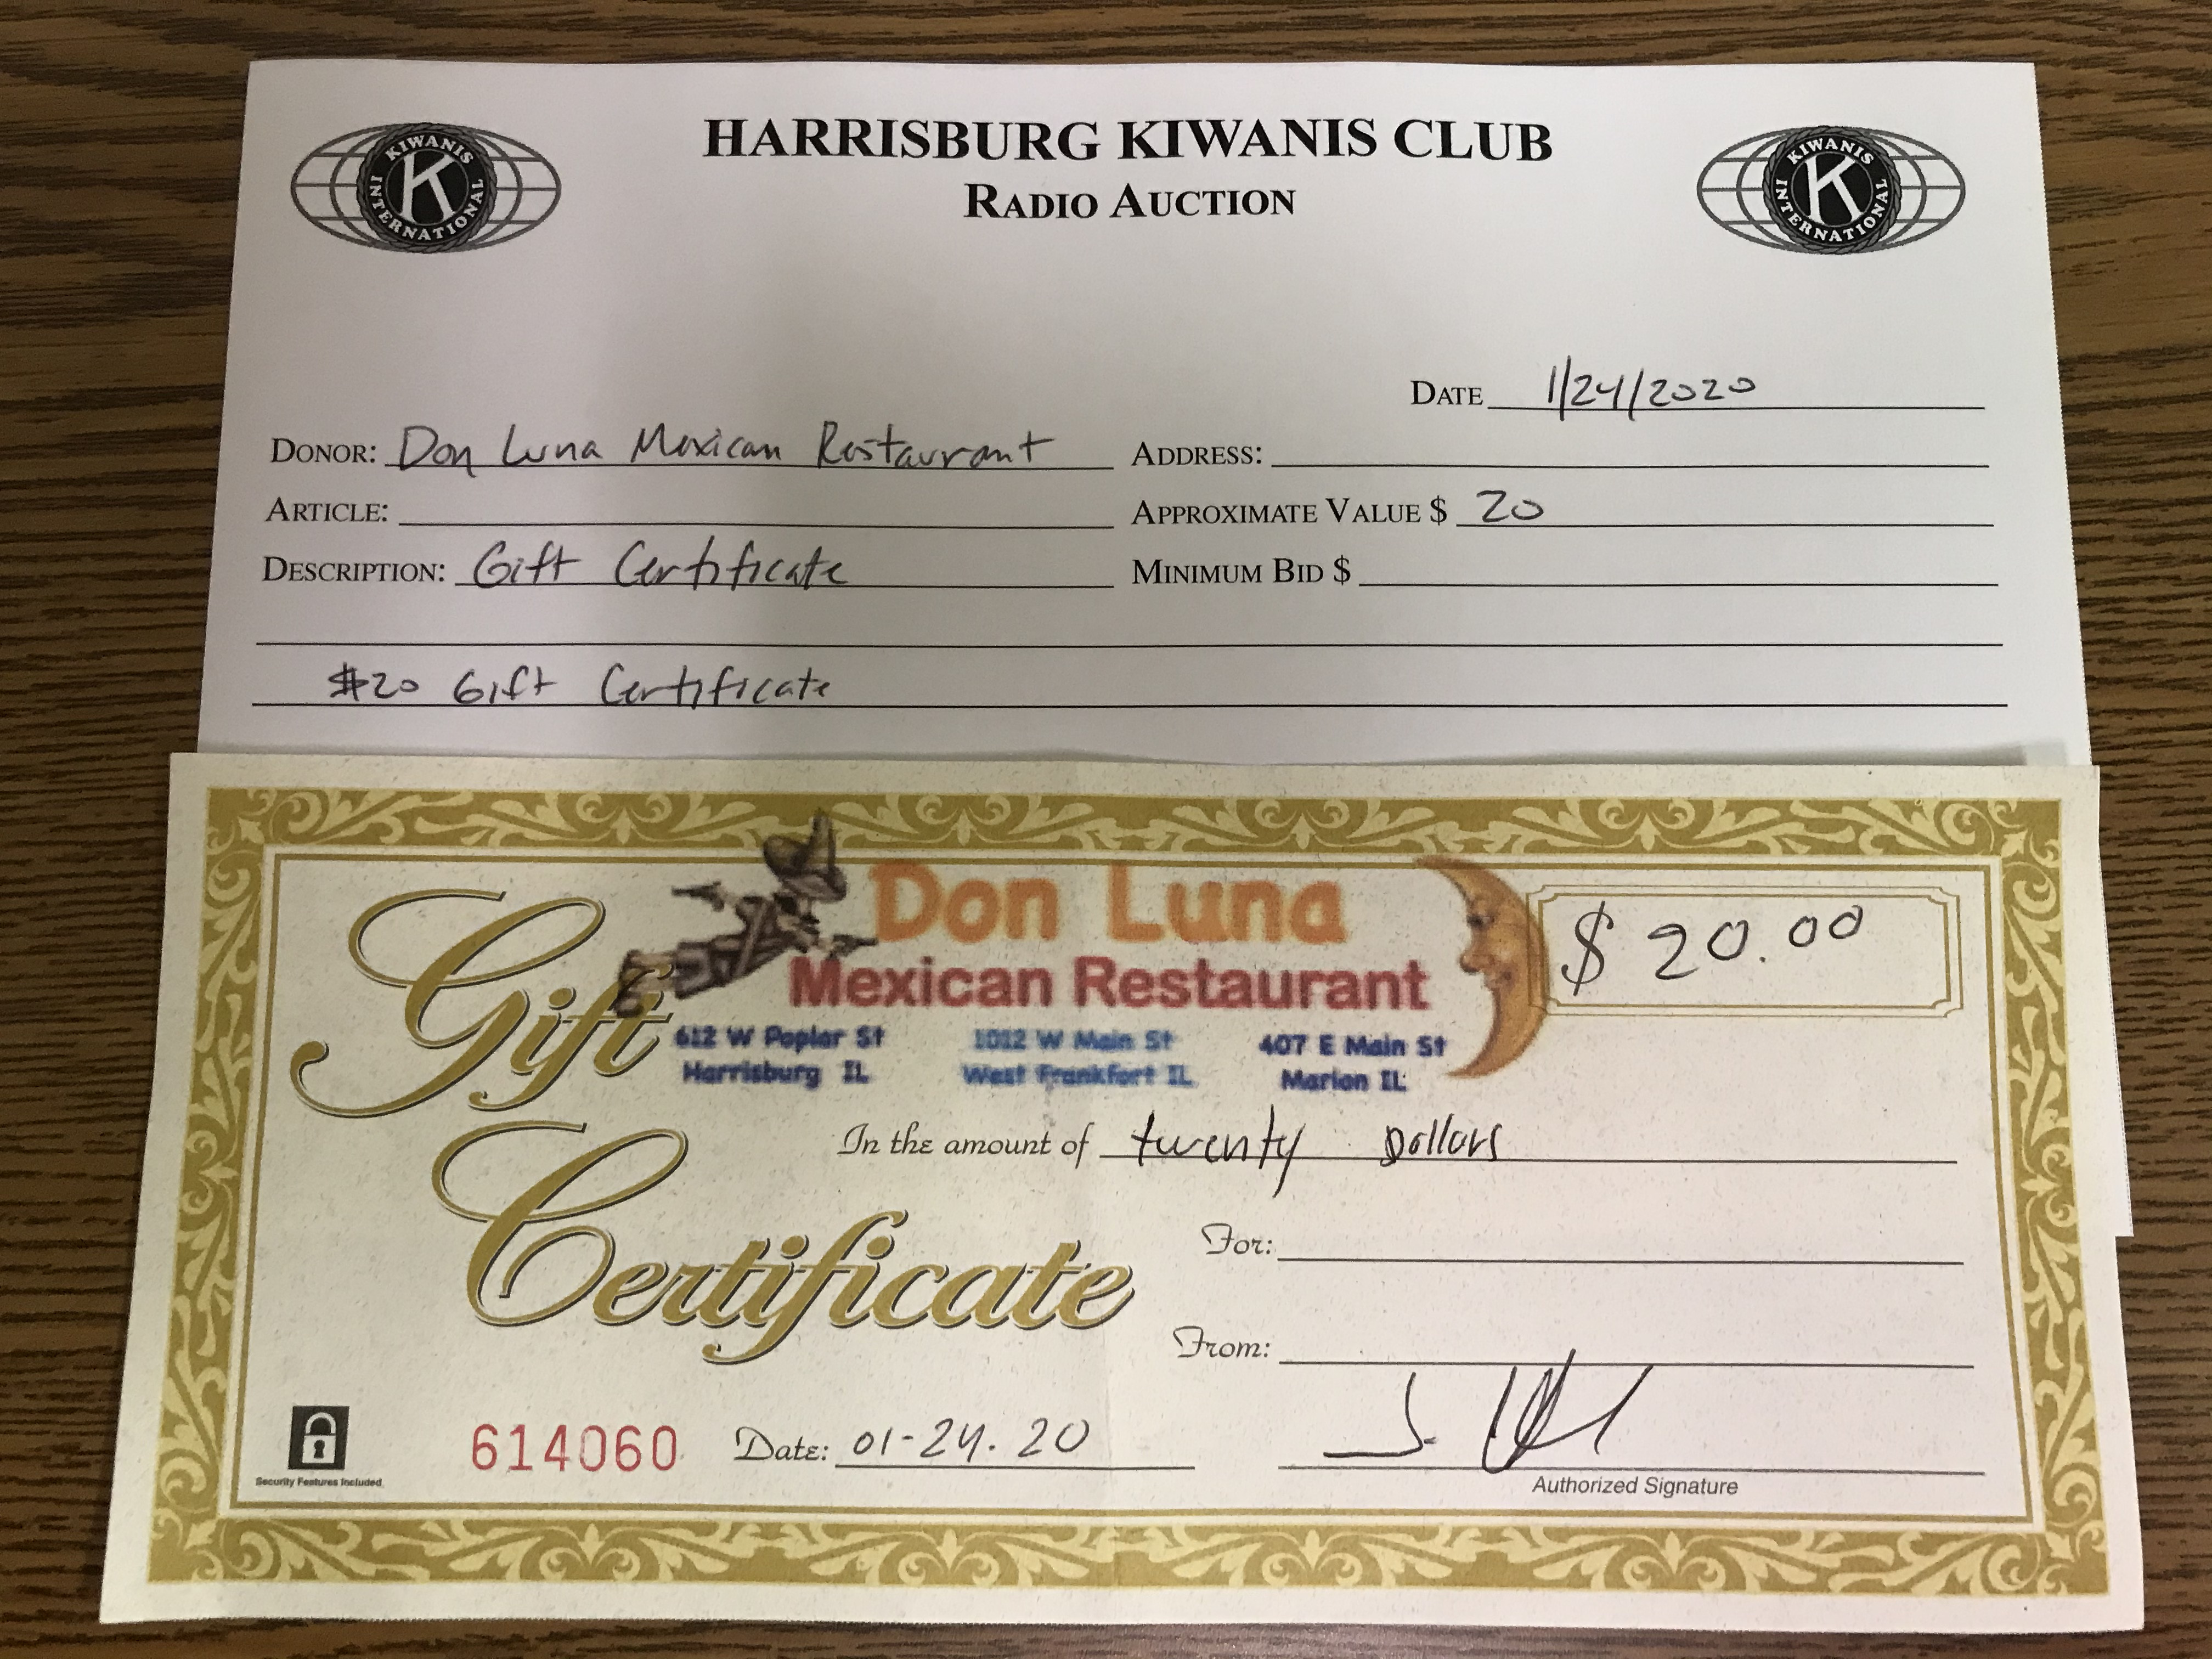 Item 402 - Don Luna Mexican Restaurant $20 Gift Certificate